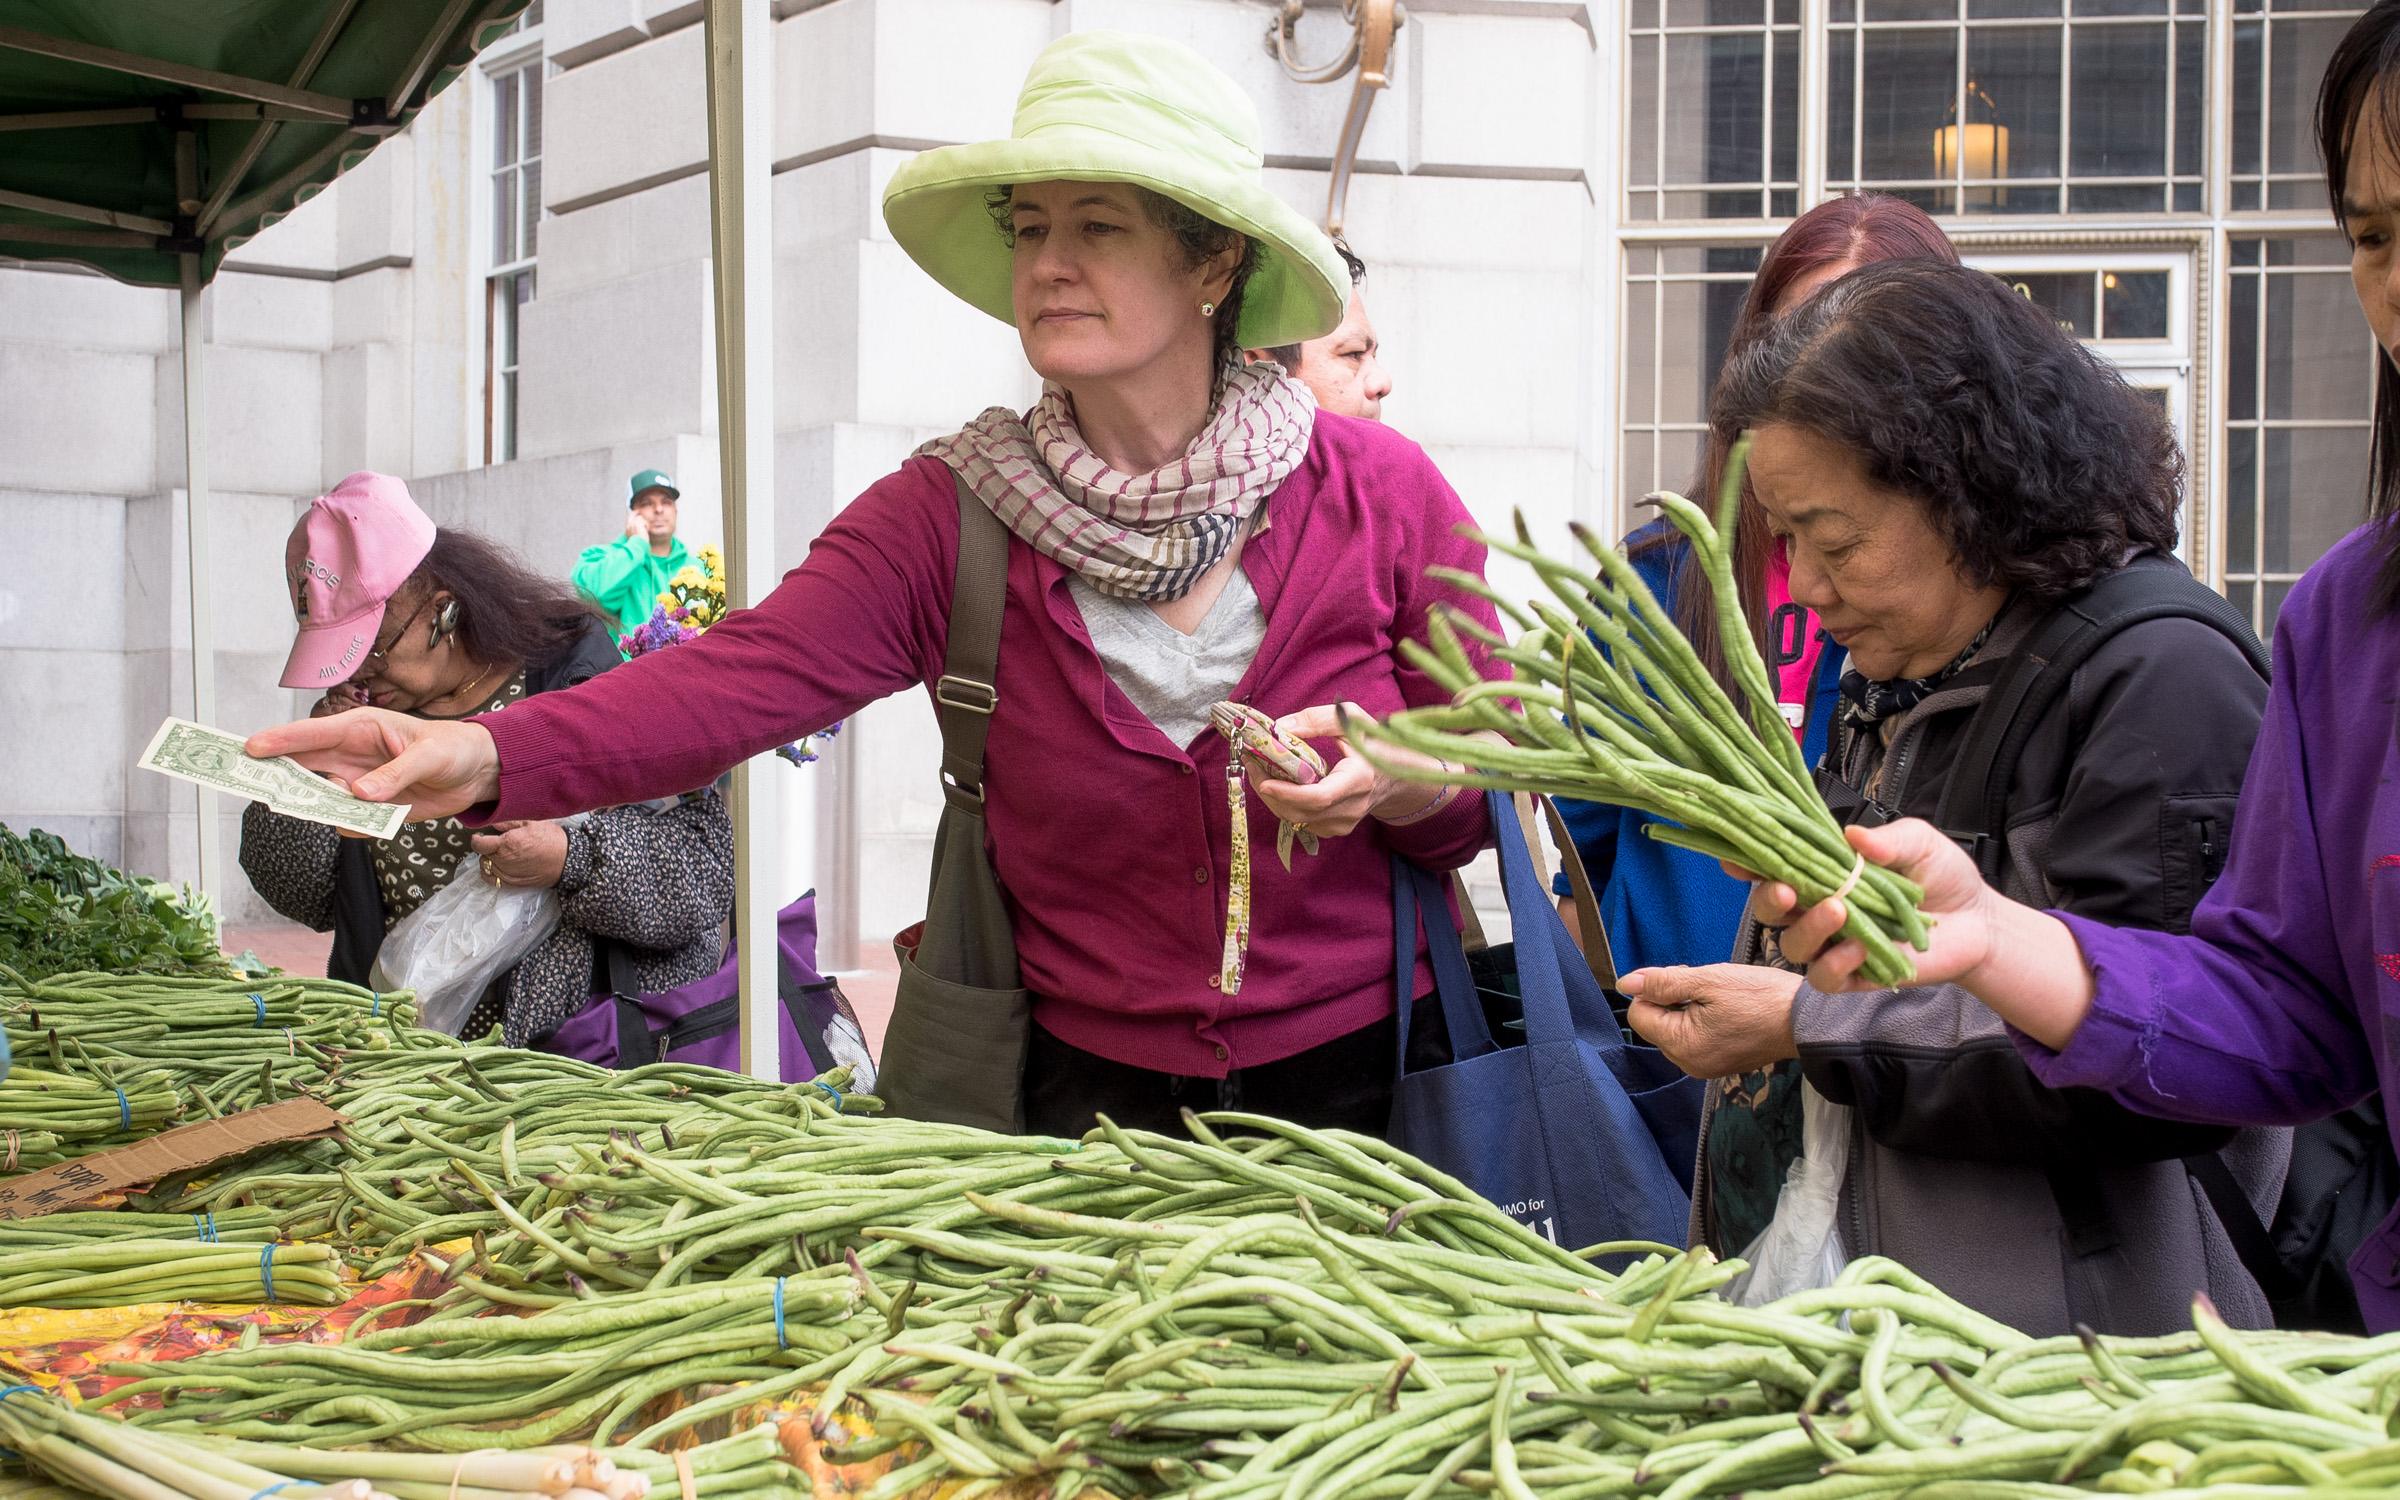 Farmer's Market, San Francisco, 10:30am